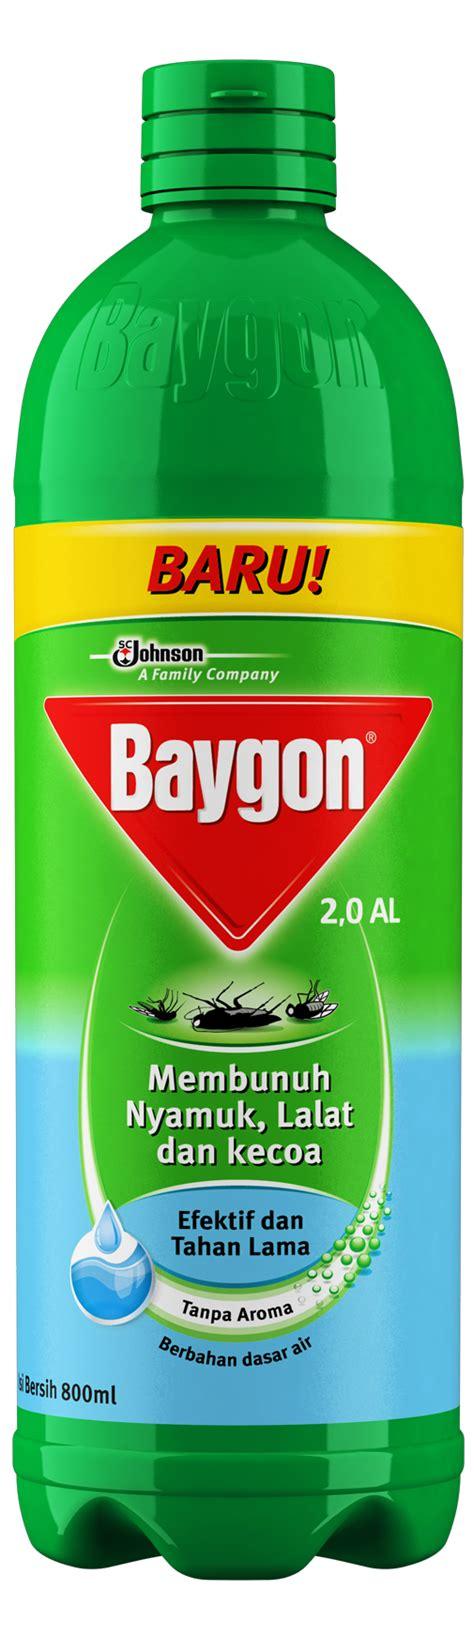 B7 Baygon Citrus Fresh 600ml baygon cair